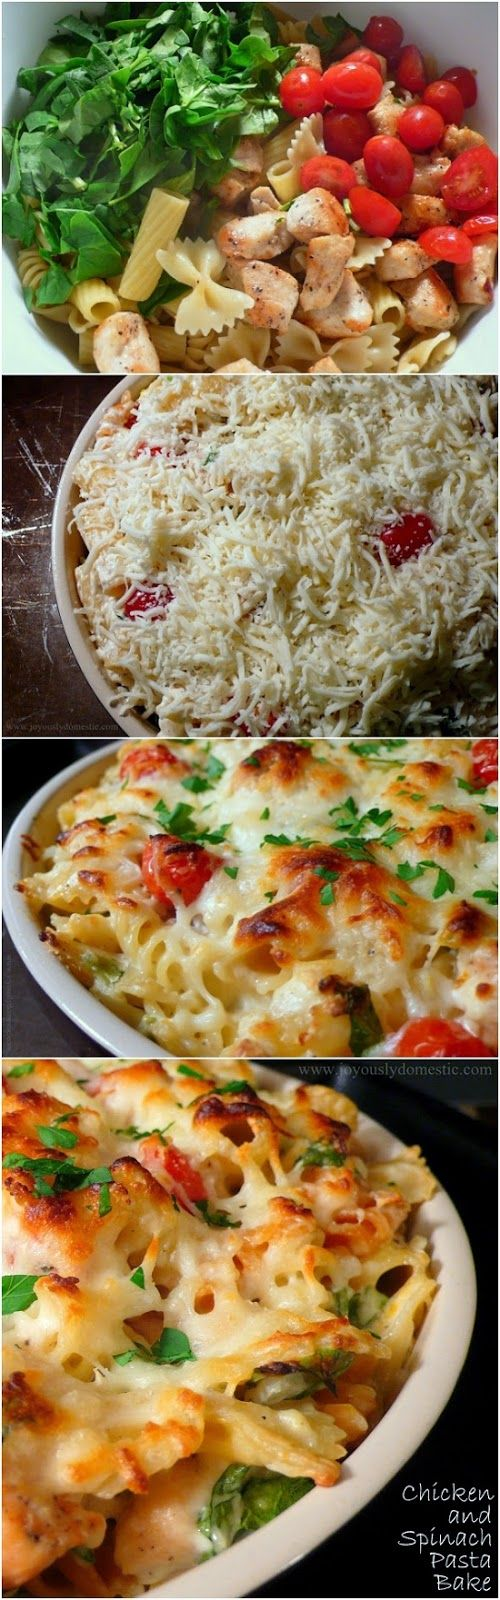 queijo+espinafre+tomate pasta